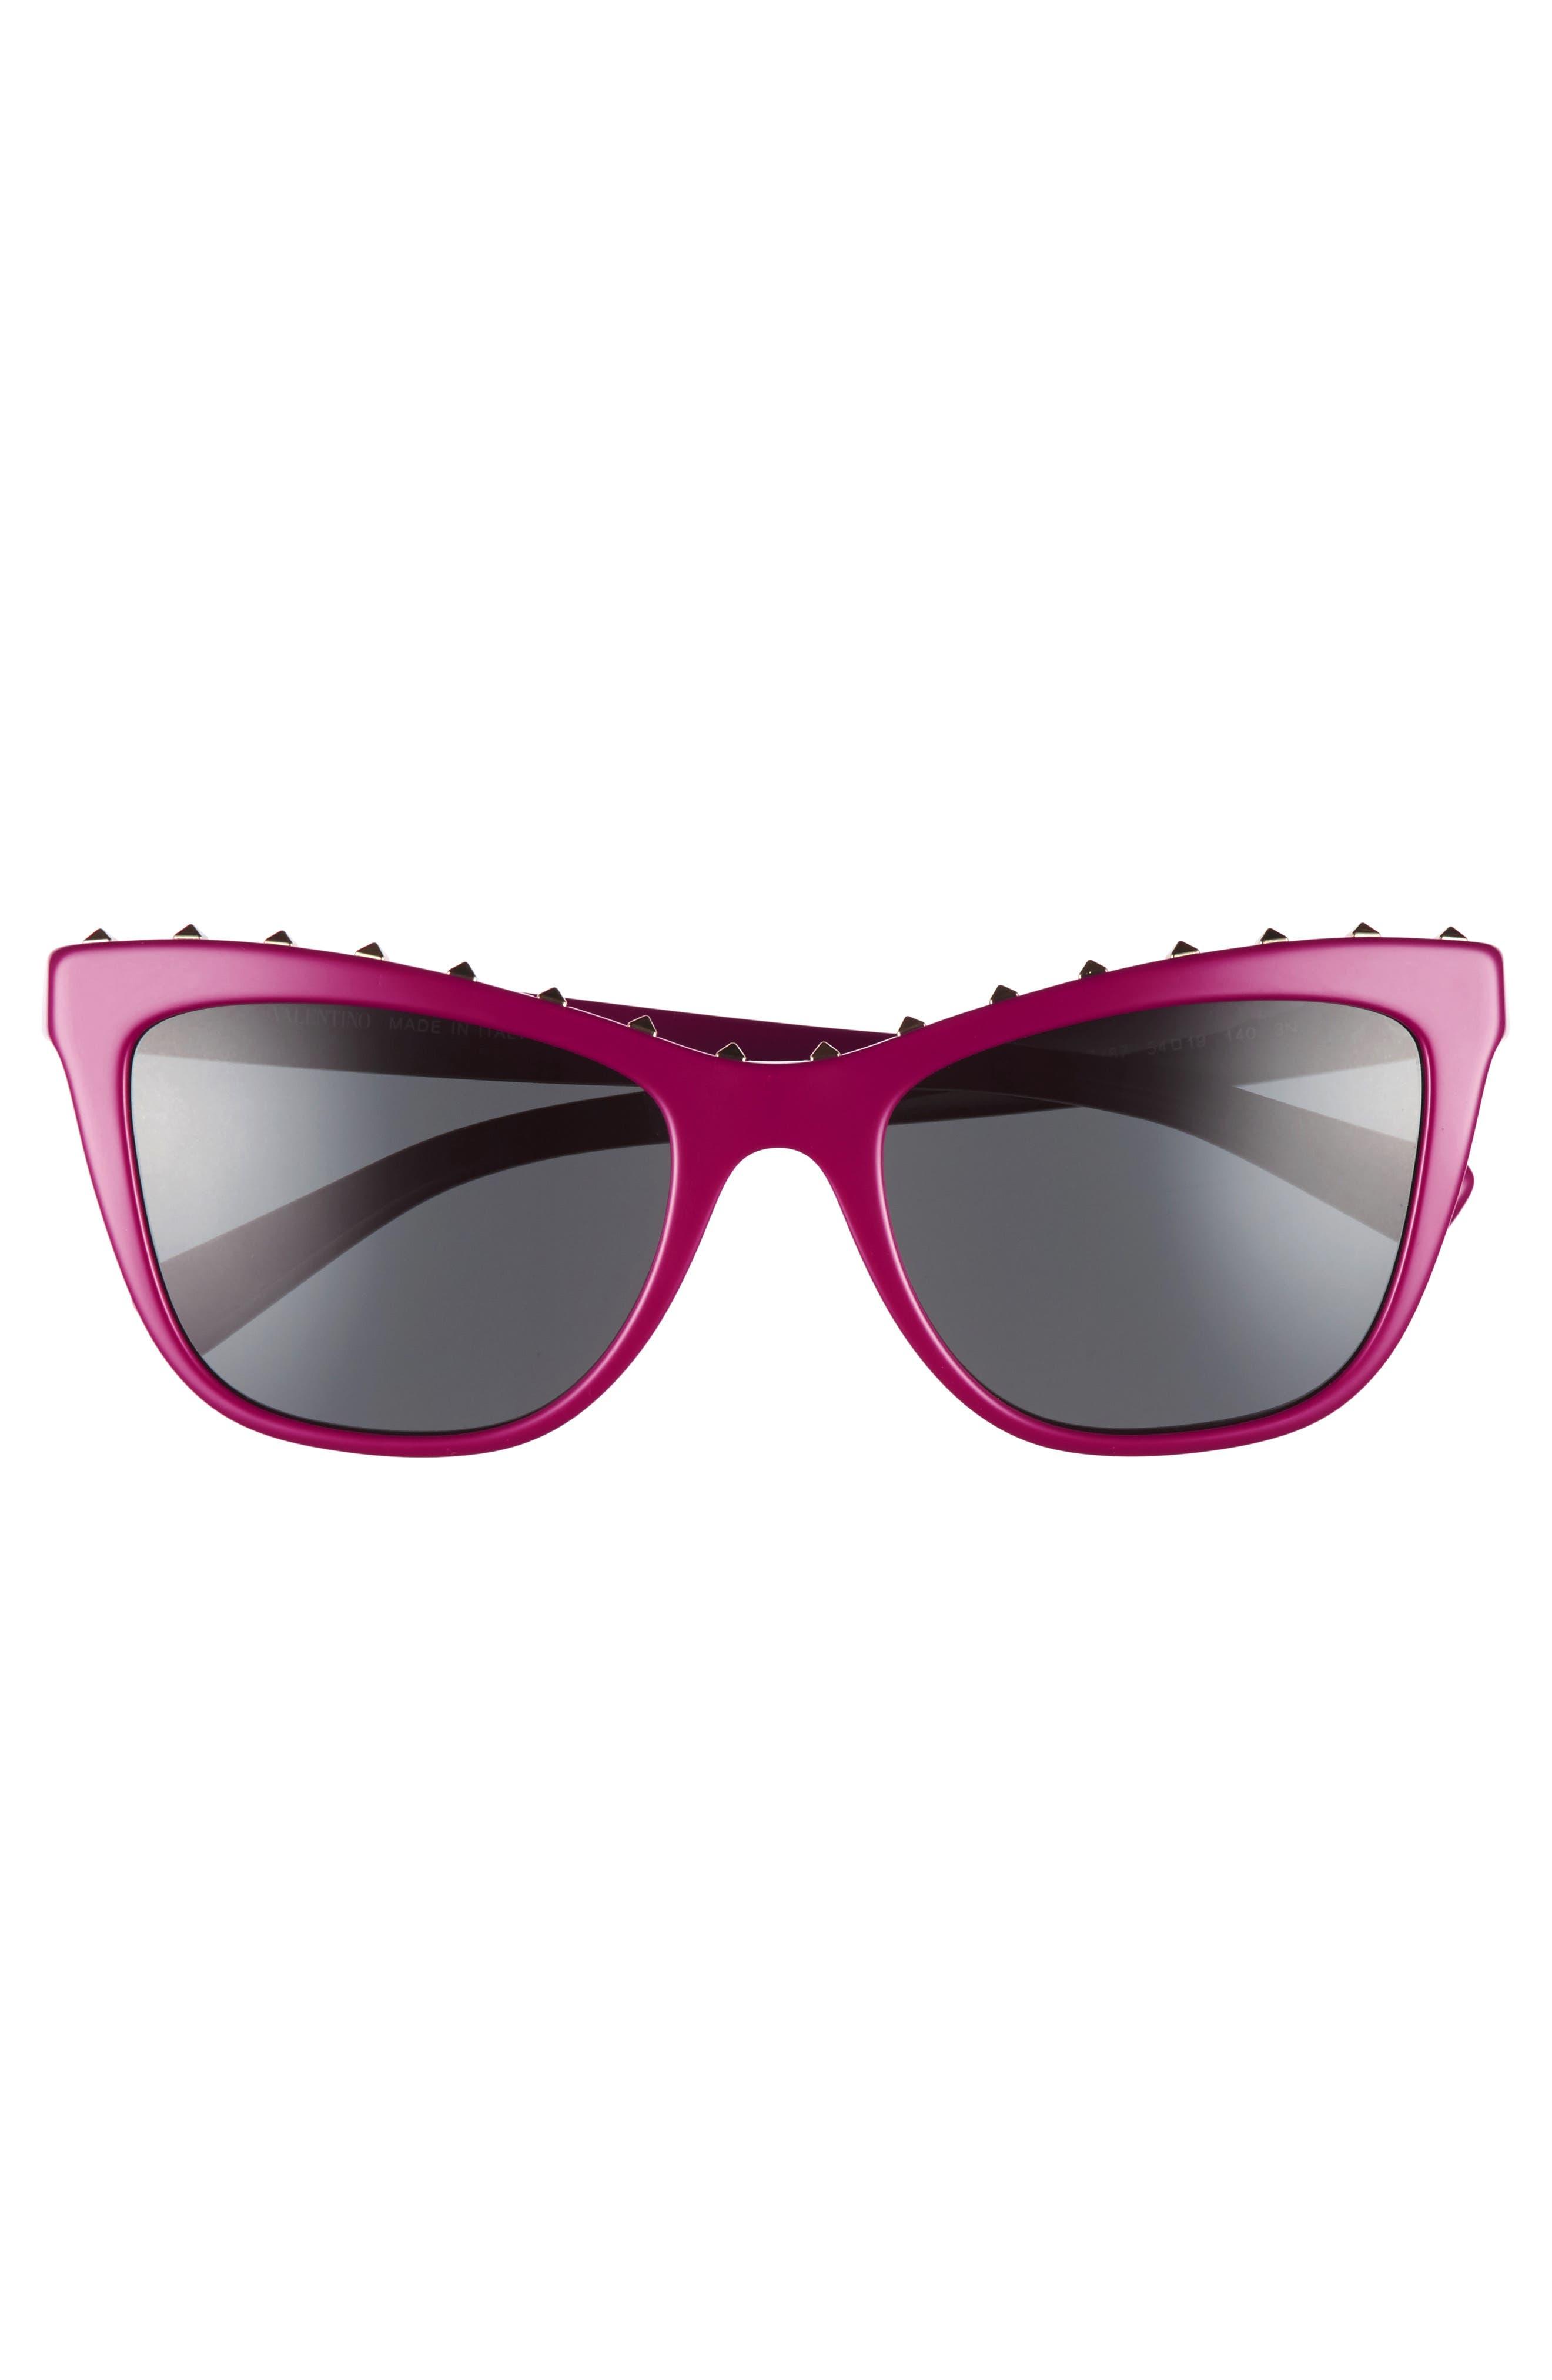 Rockstud 54mm Cat Eye Sunglasses,                             Alternate thumbnail 3, color,                             Fuchsia